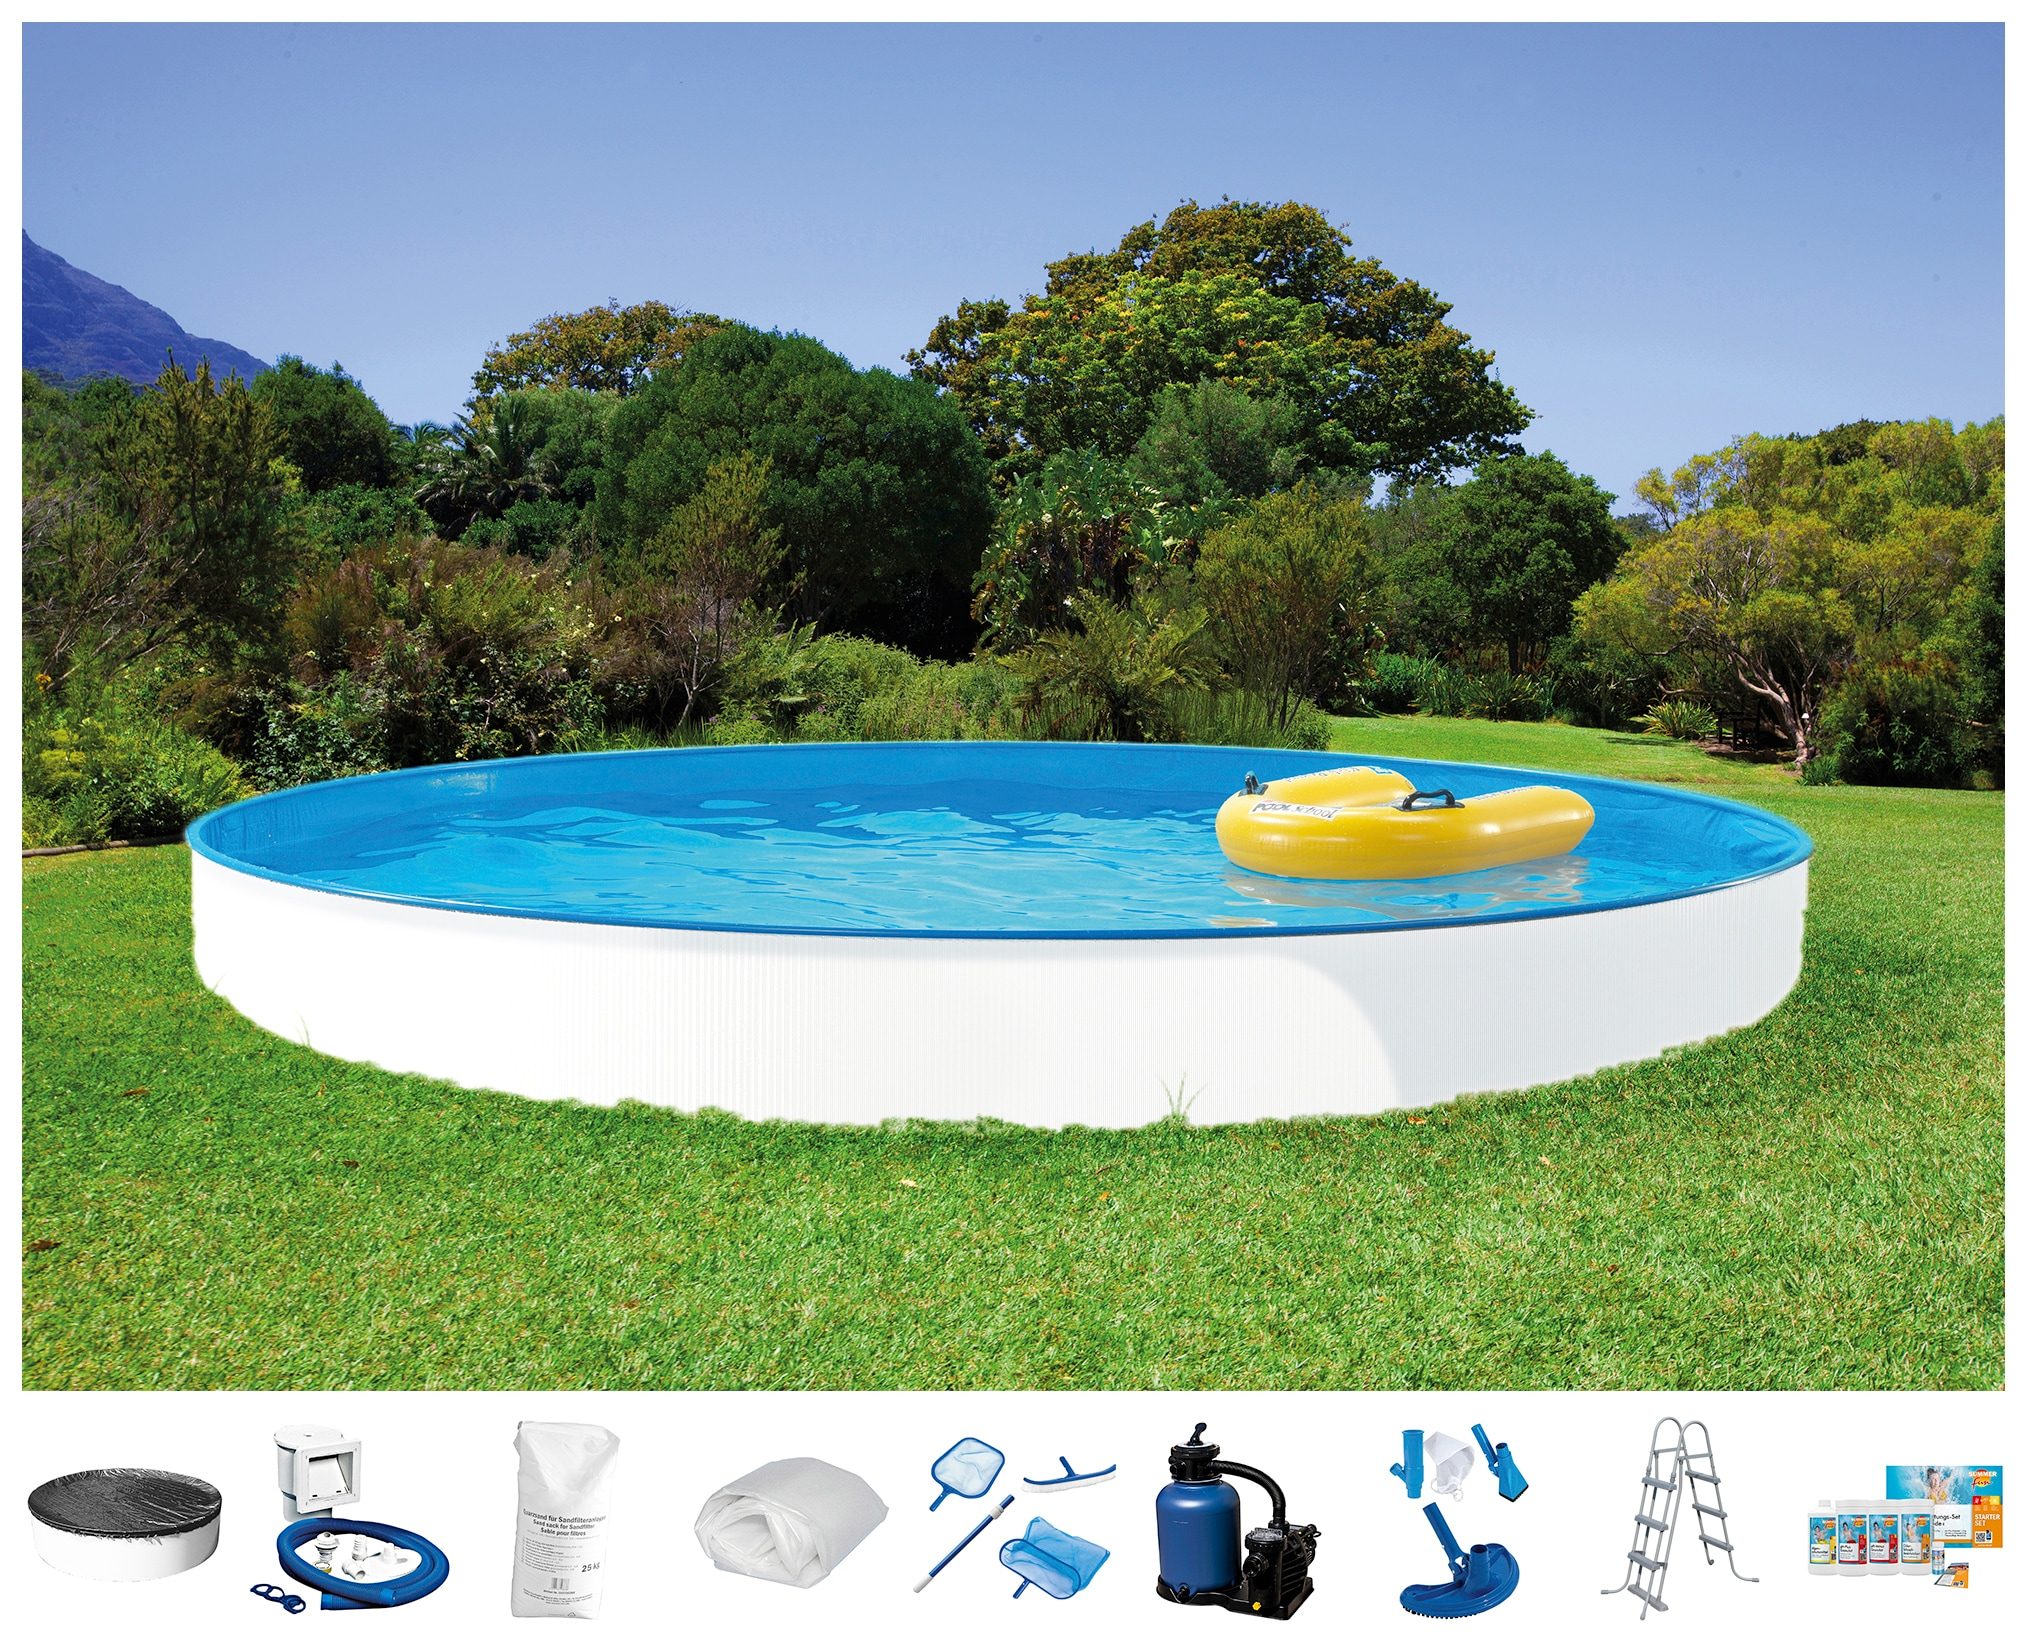 Clear Pool Set: Rundpool »Spar-Set 10-tlg.« in 9 verschiedenen Größen   Garten > Swimmingpools   CLEAR POOL